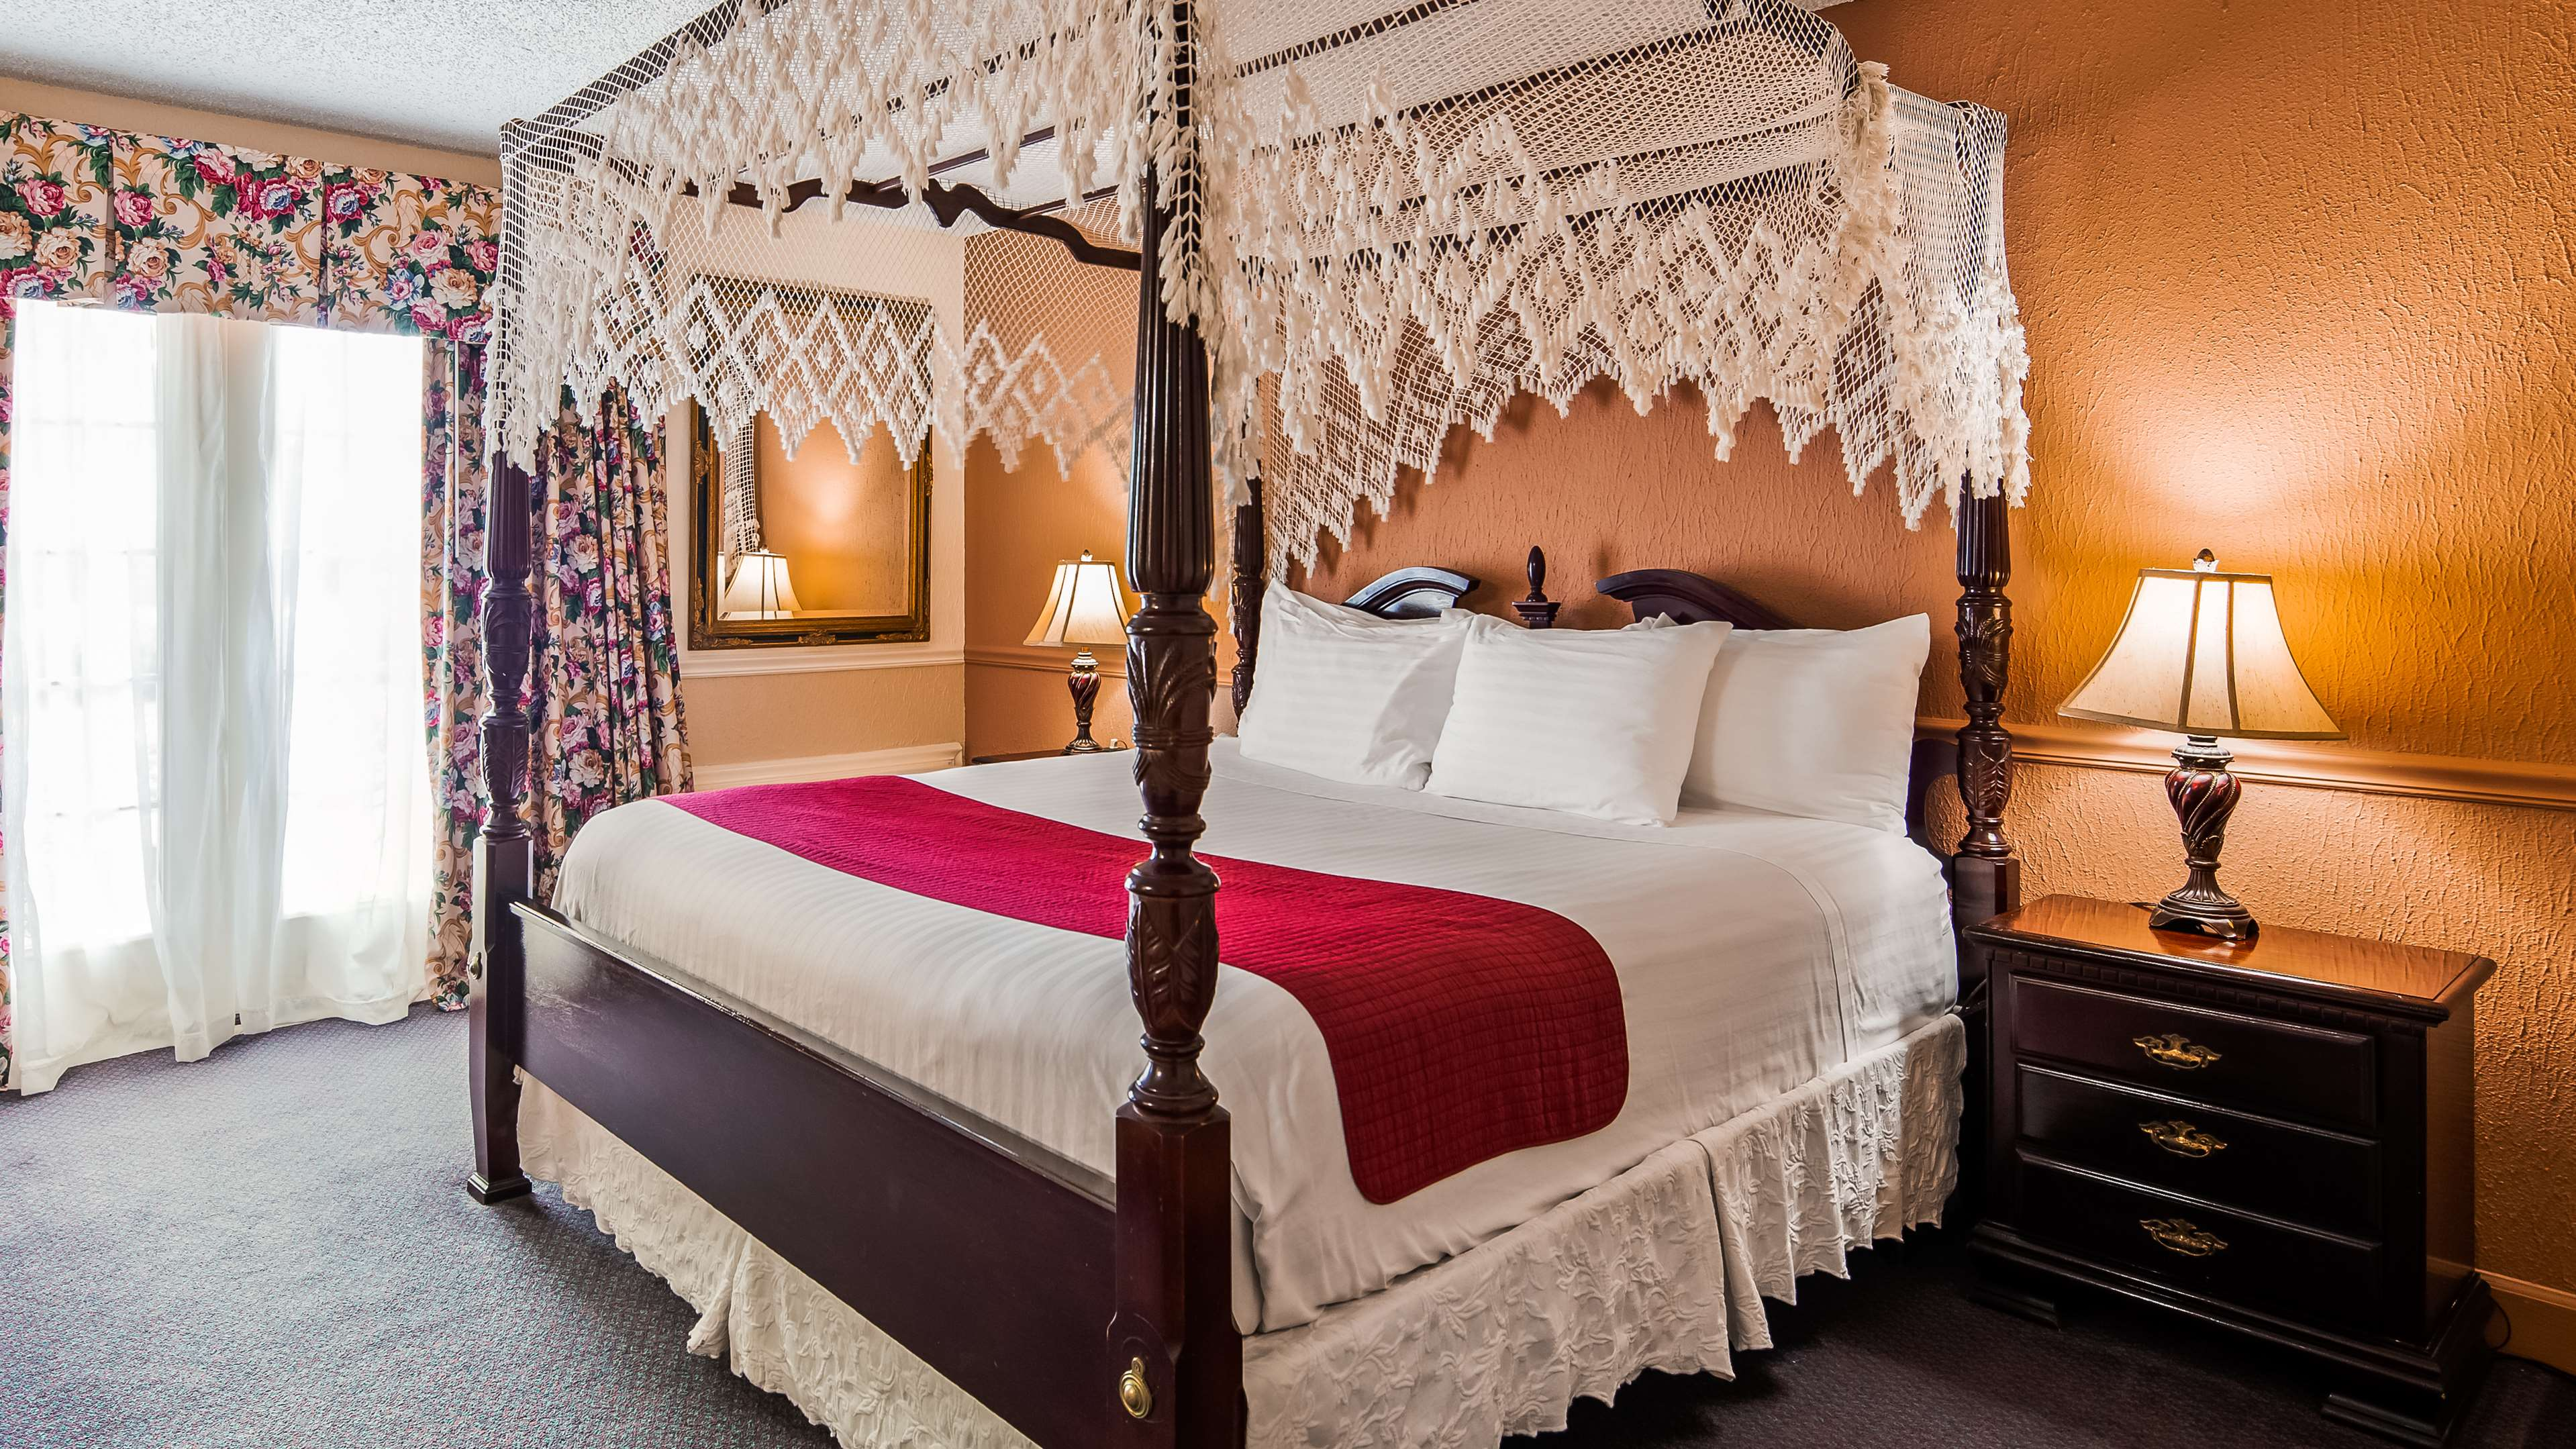 SureStay Plus Hotel by Best Western Baton Rouge image 13